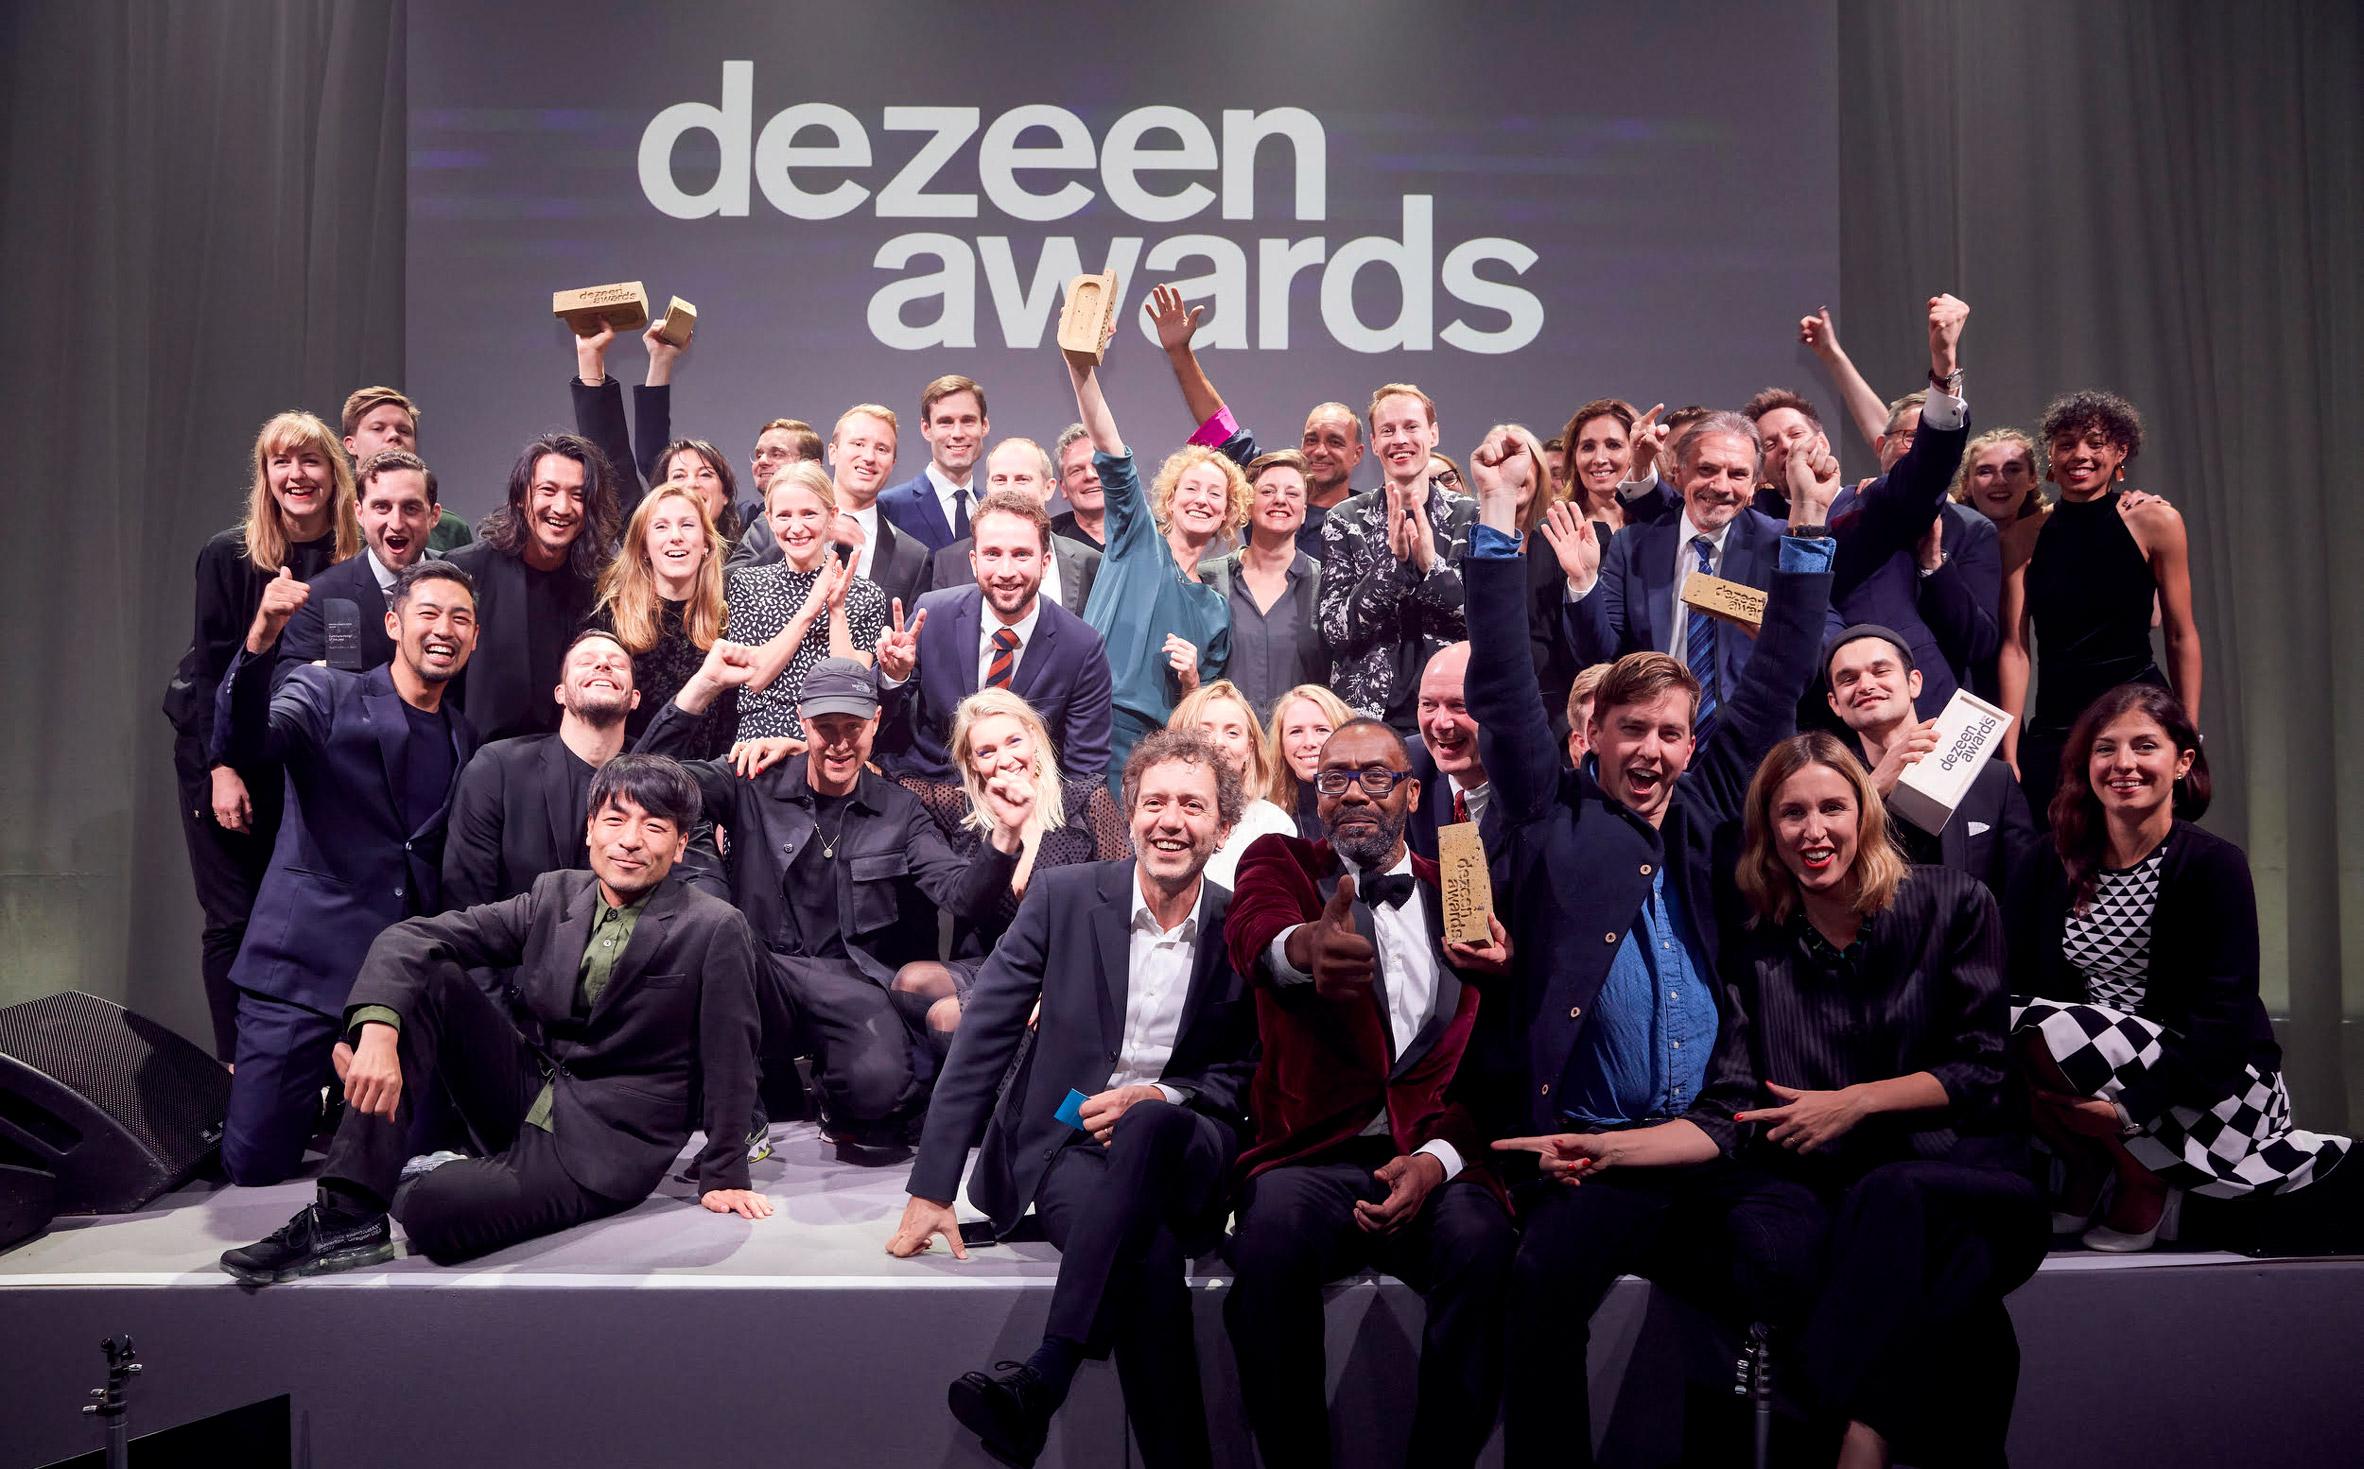 Dezeen Awards winners revealed in London ceremony last night